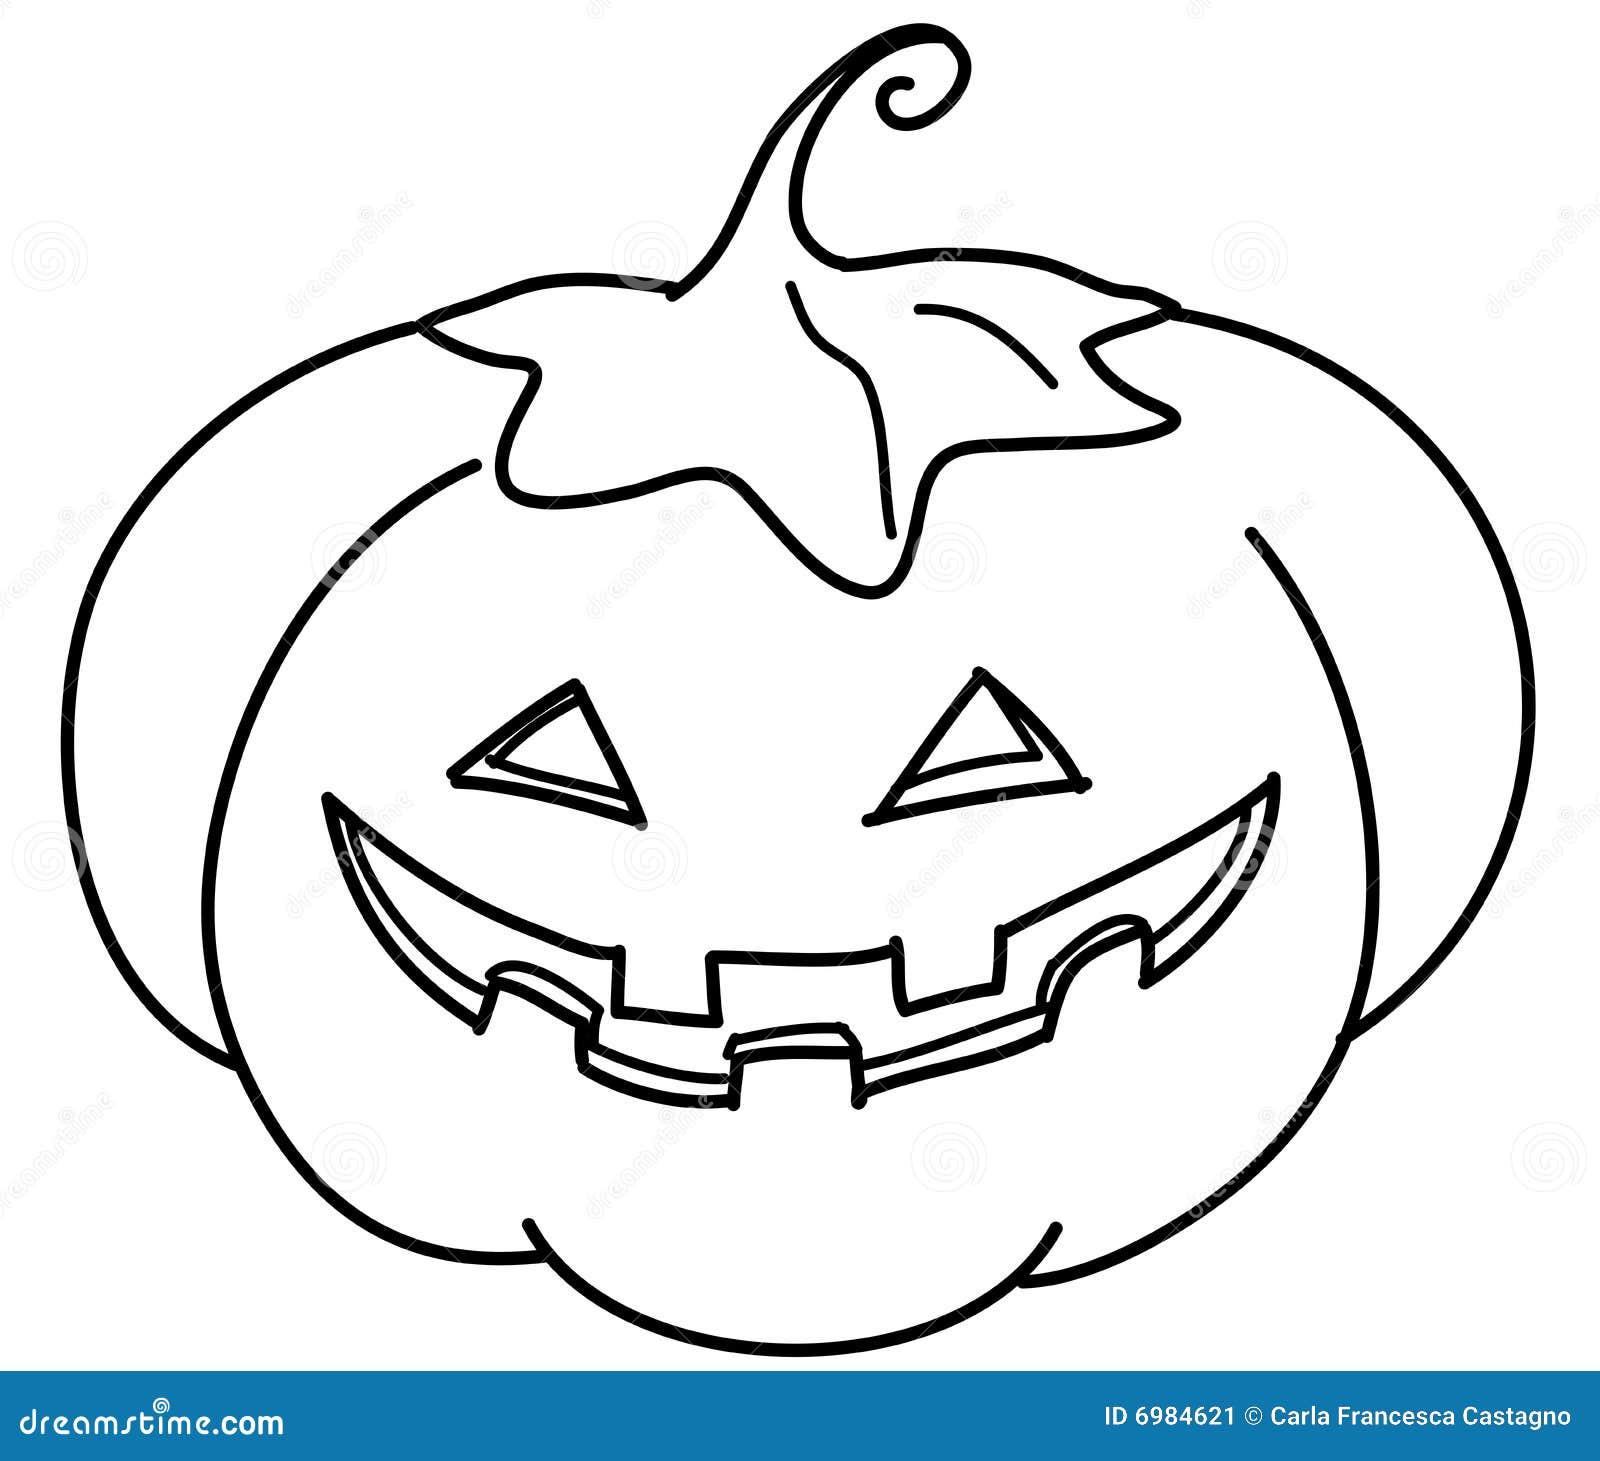 Coloring Jack O Lantern Stock Image Image 6984621